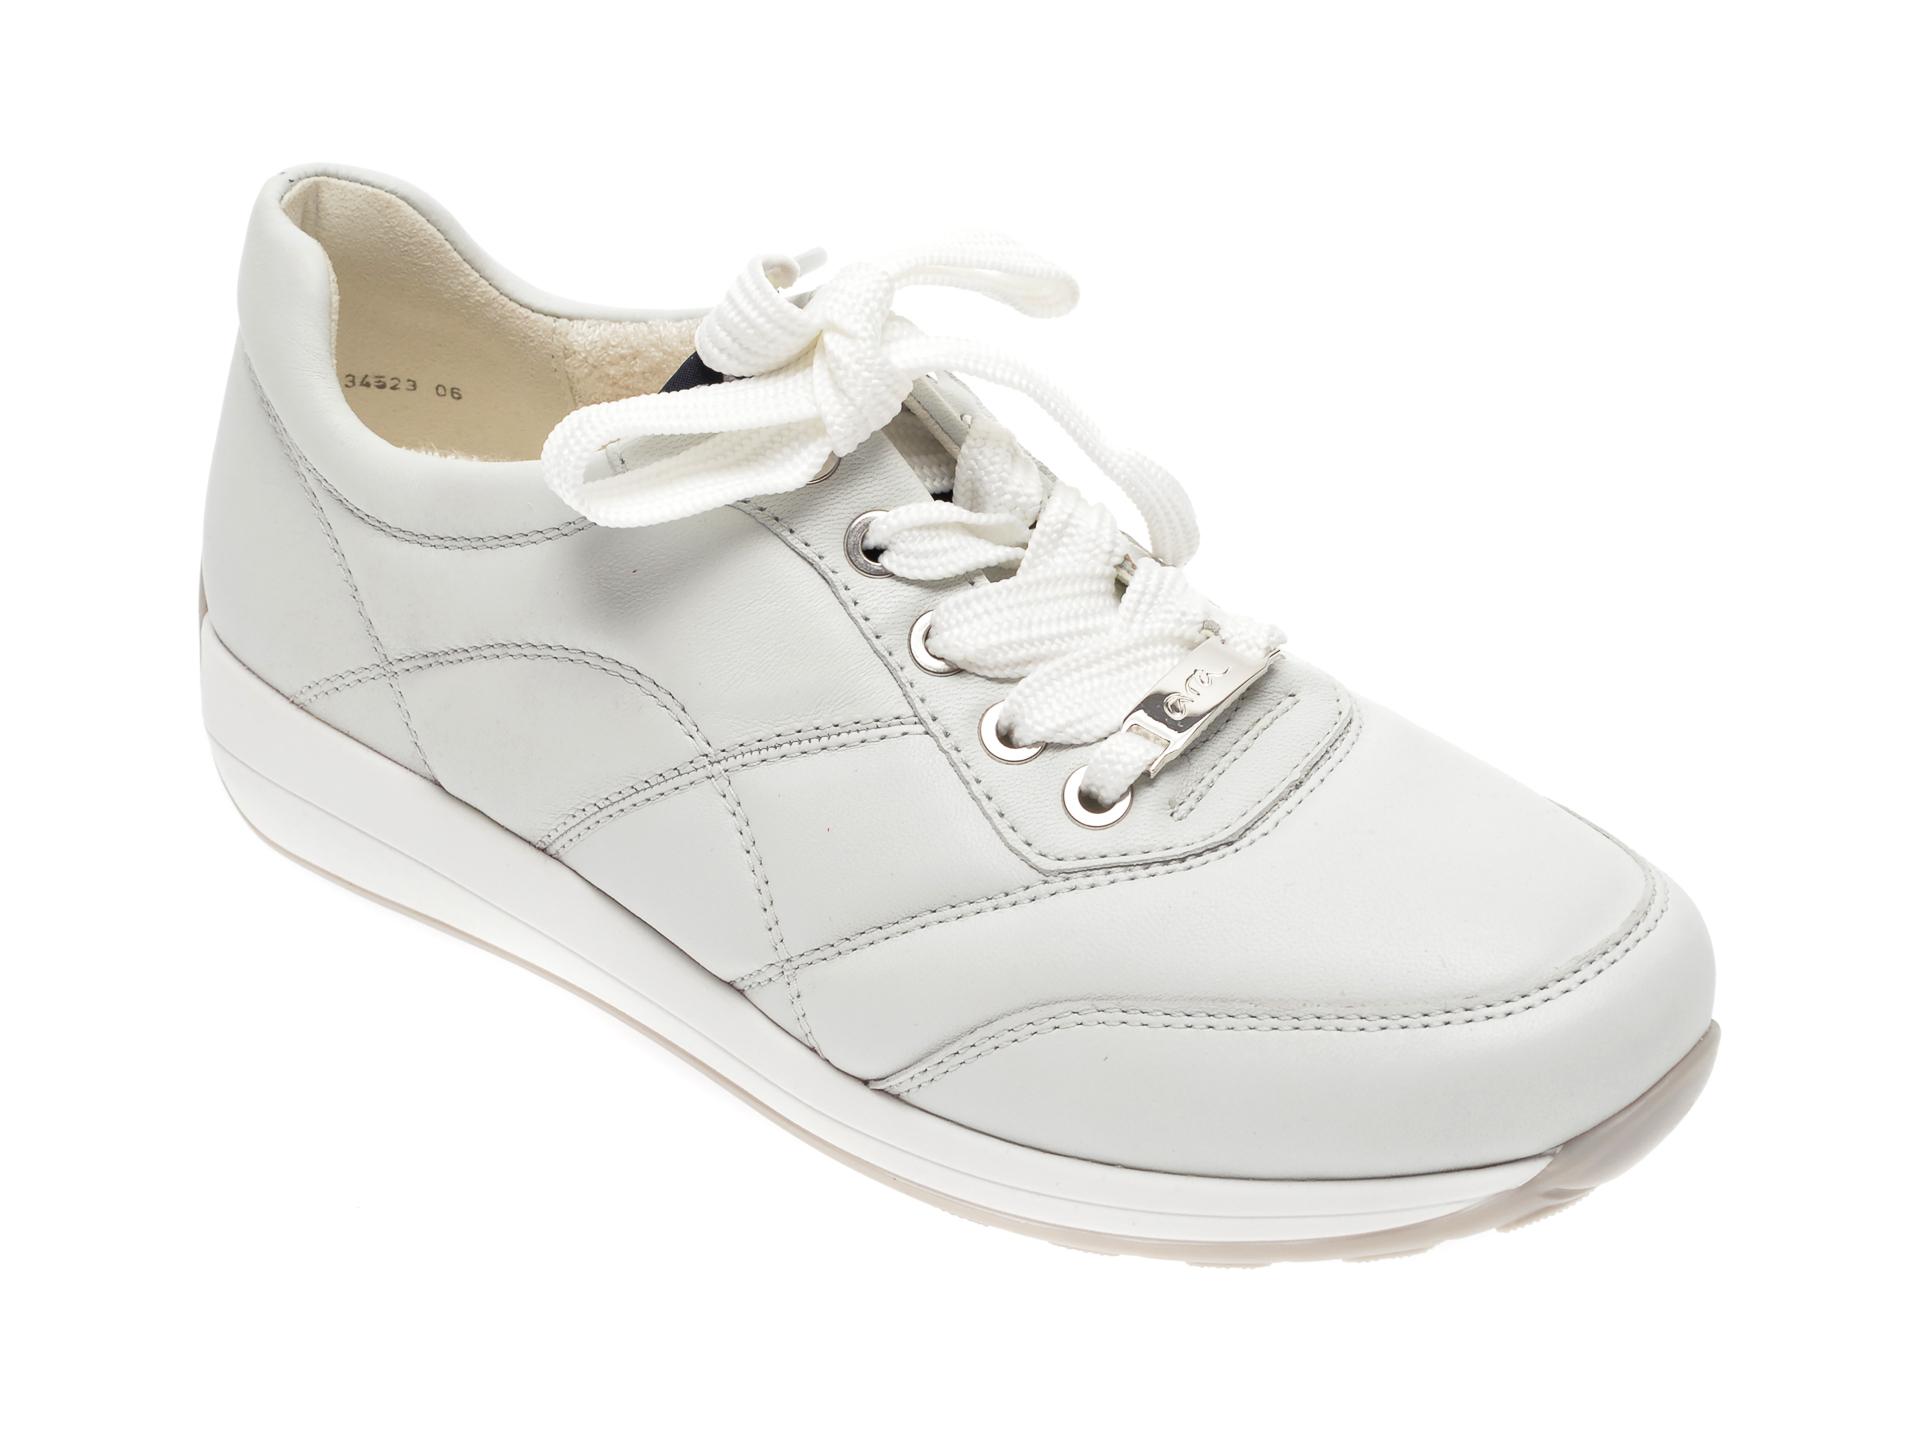 Pantofi ARA gri, 34523, din piele naturala imagine